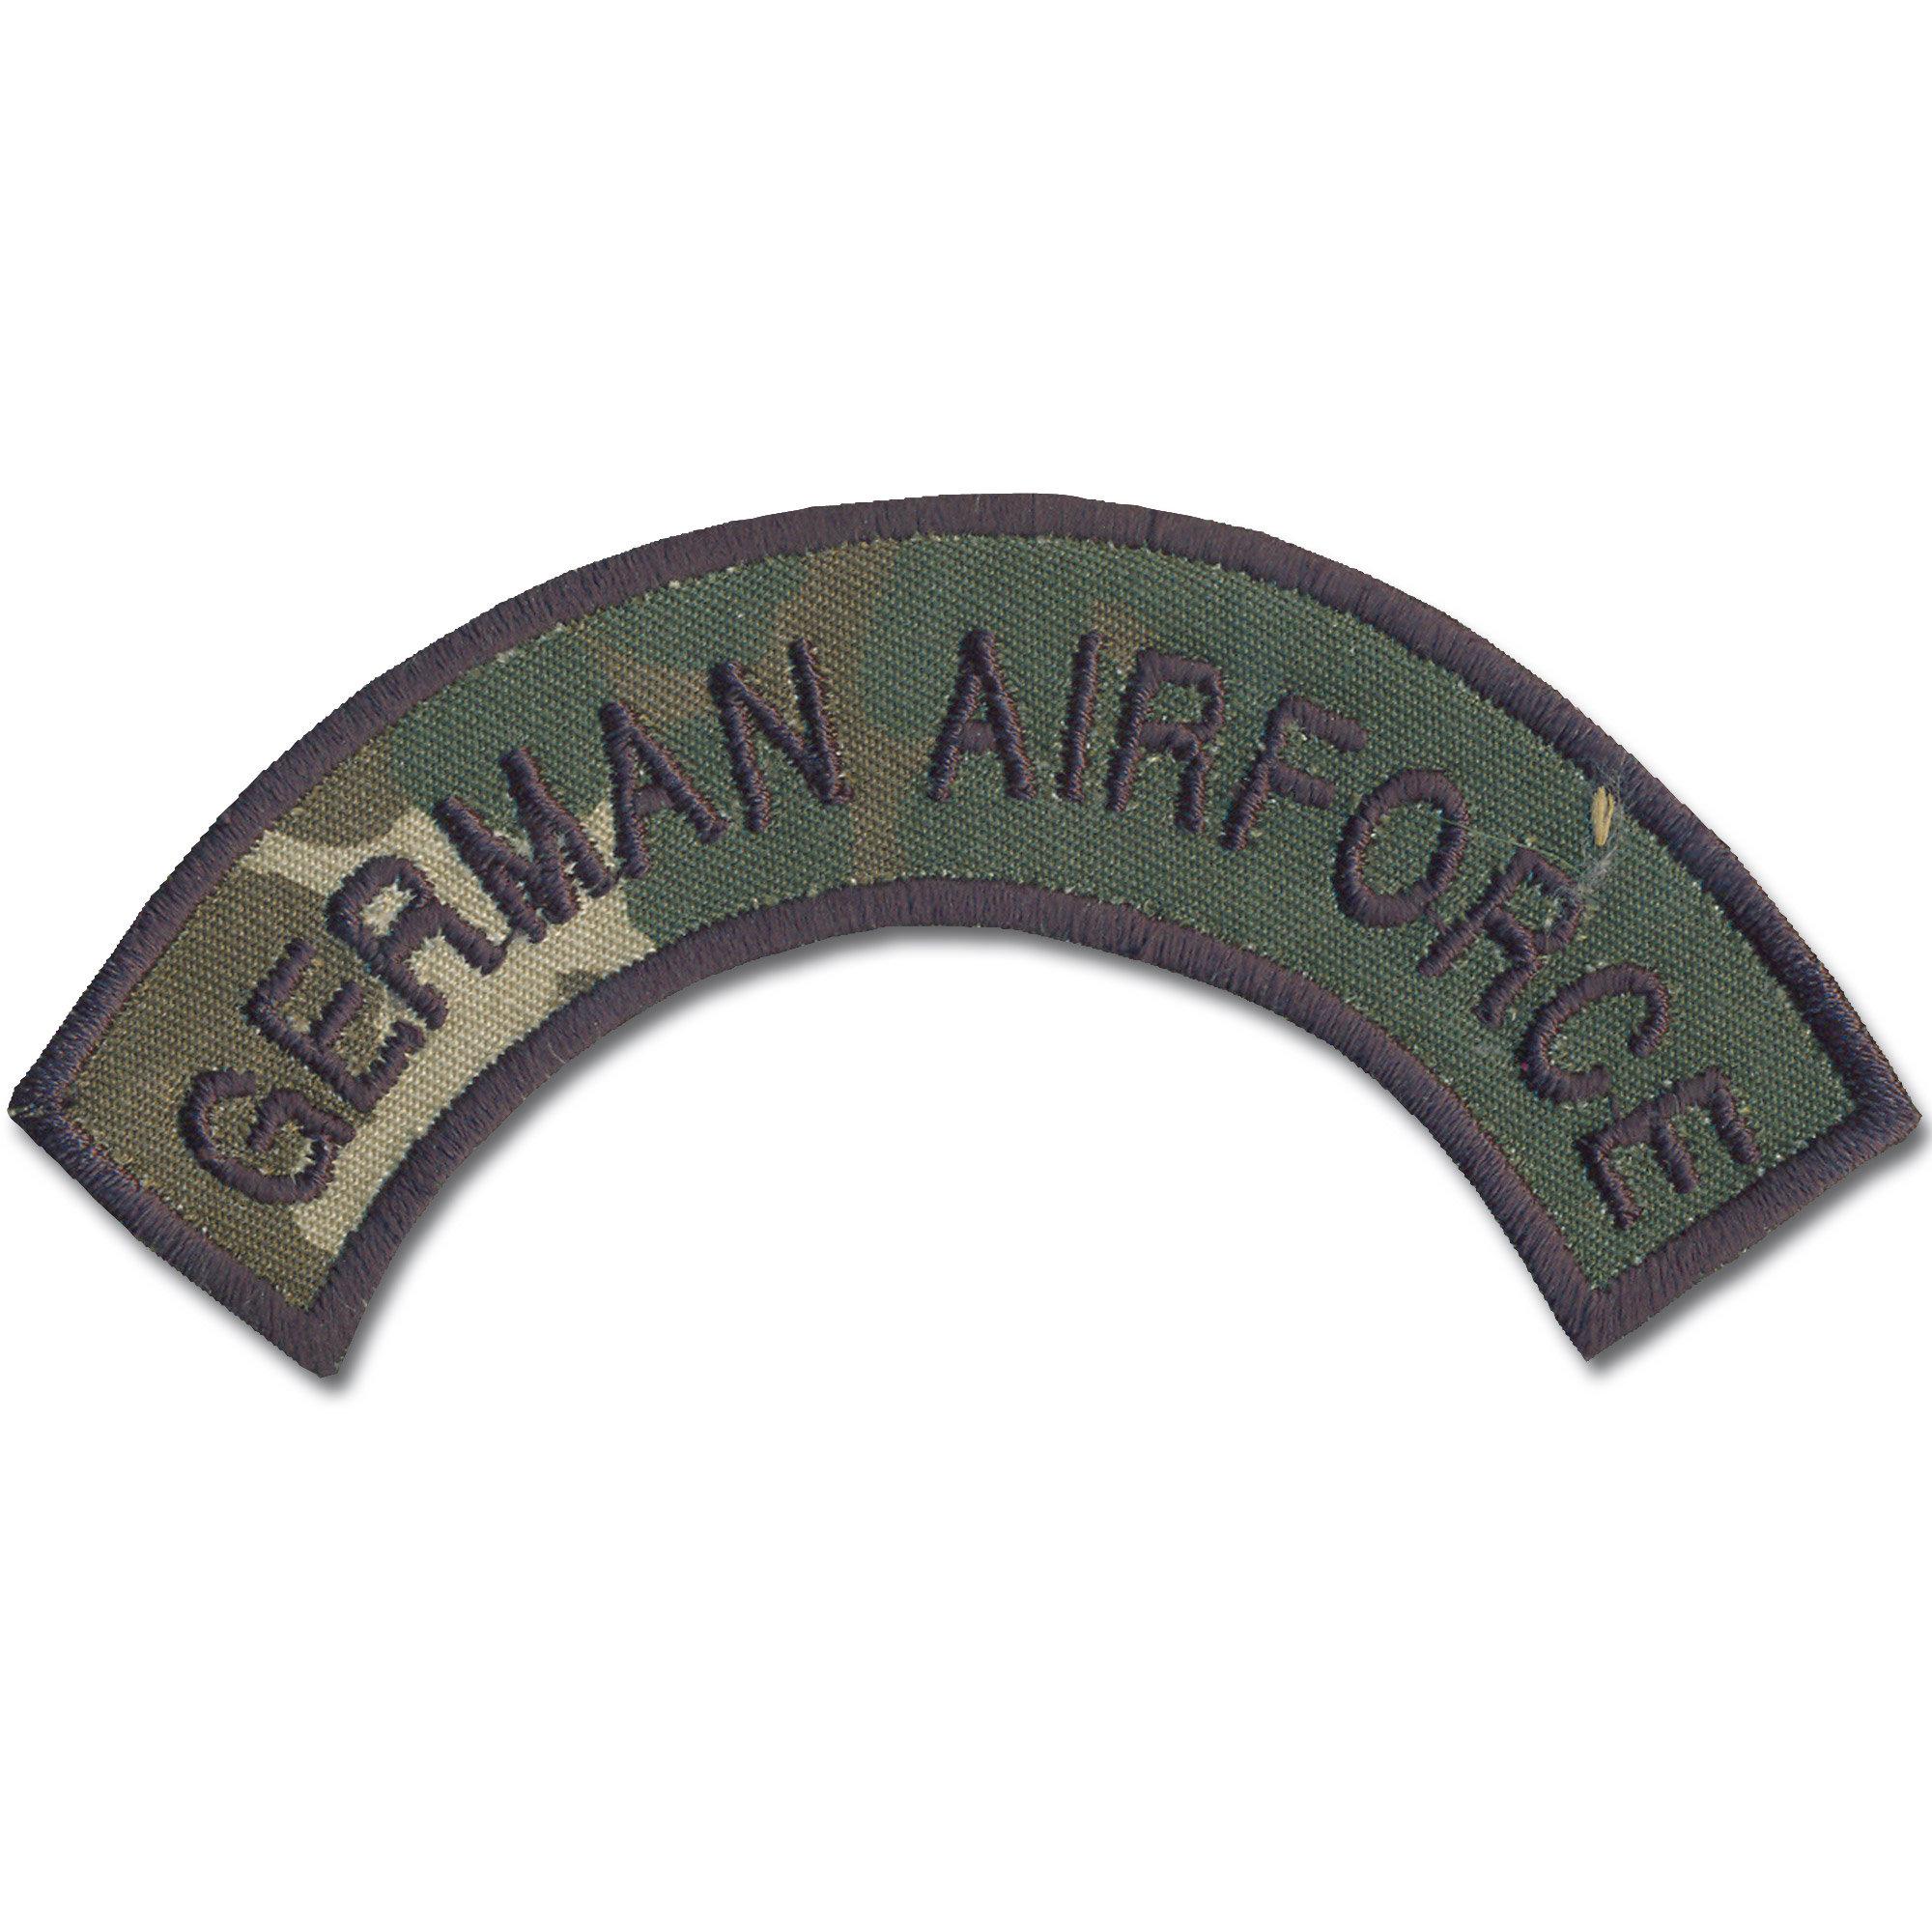 Armabzeichen German Air Force fleckdesert